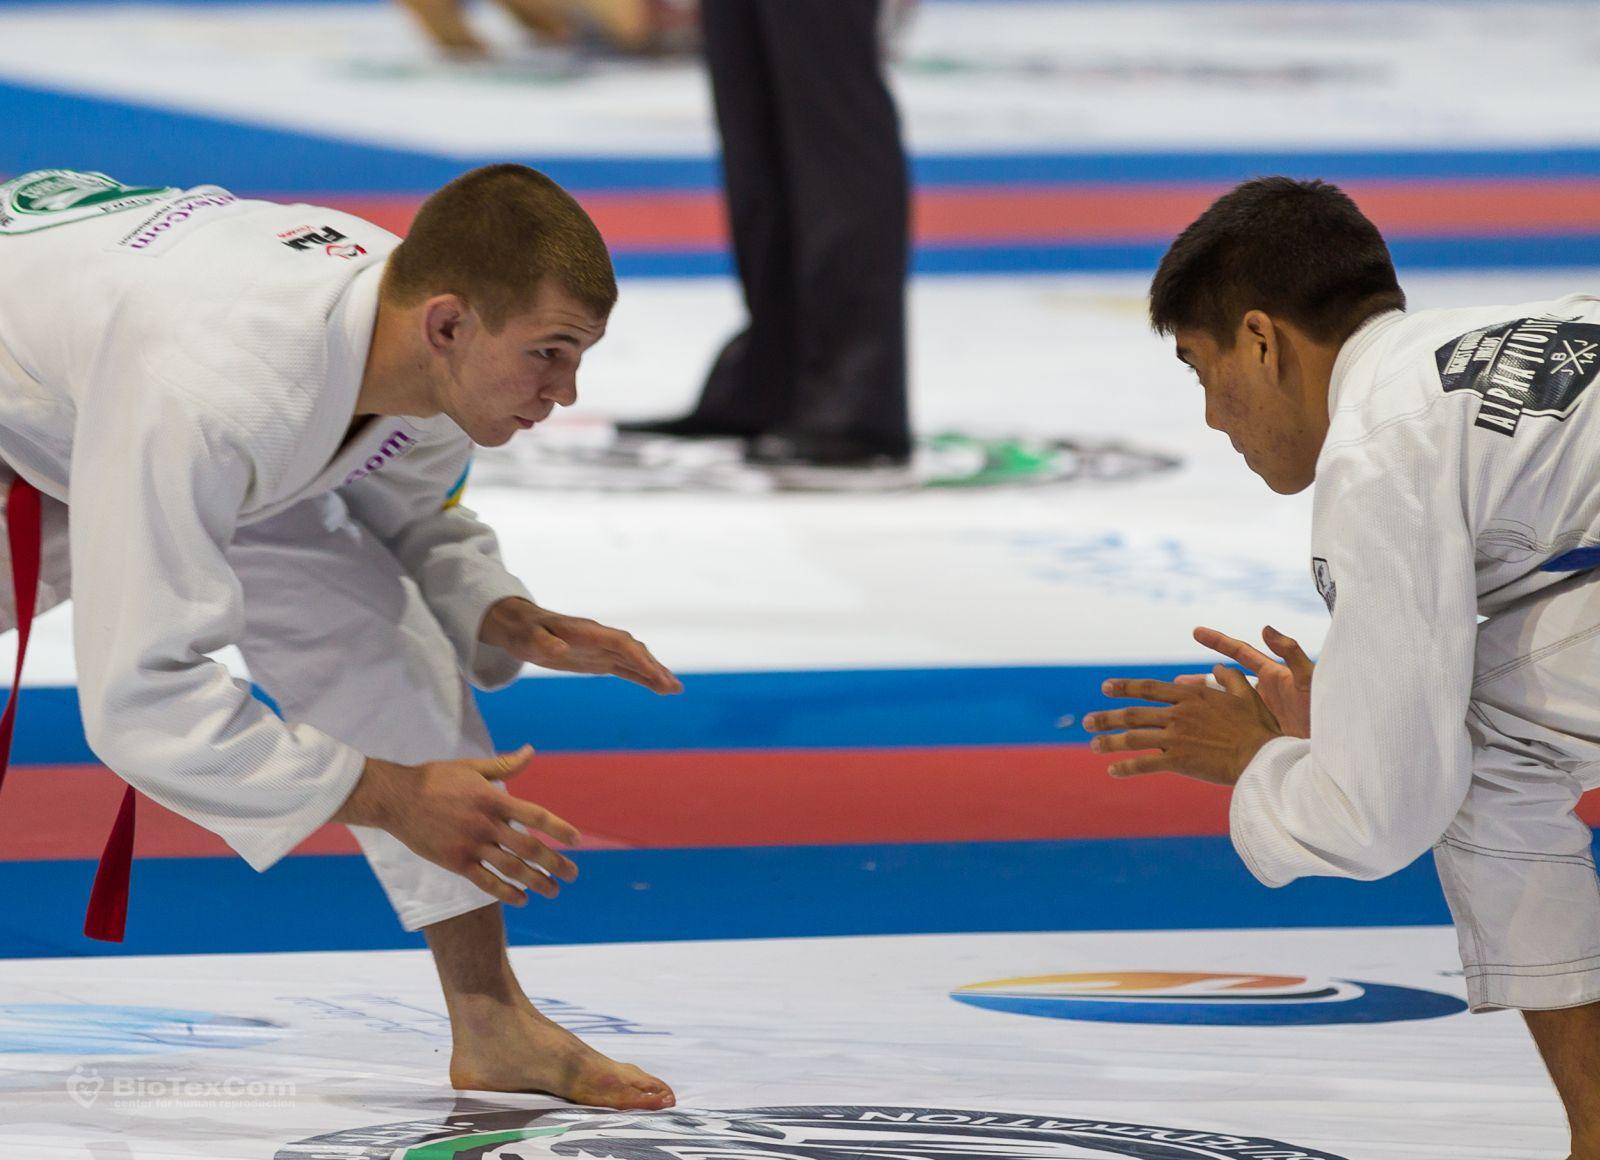 blazhko-yaroslav_Abu-Dhabi-World-Championship-2017-2_18